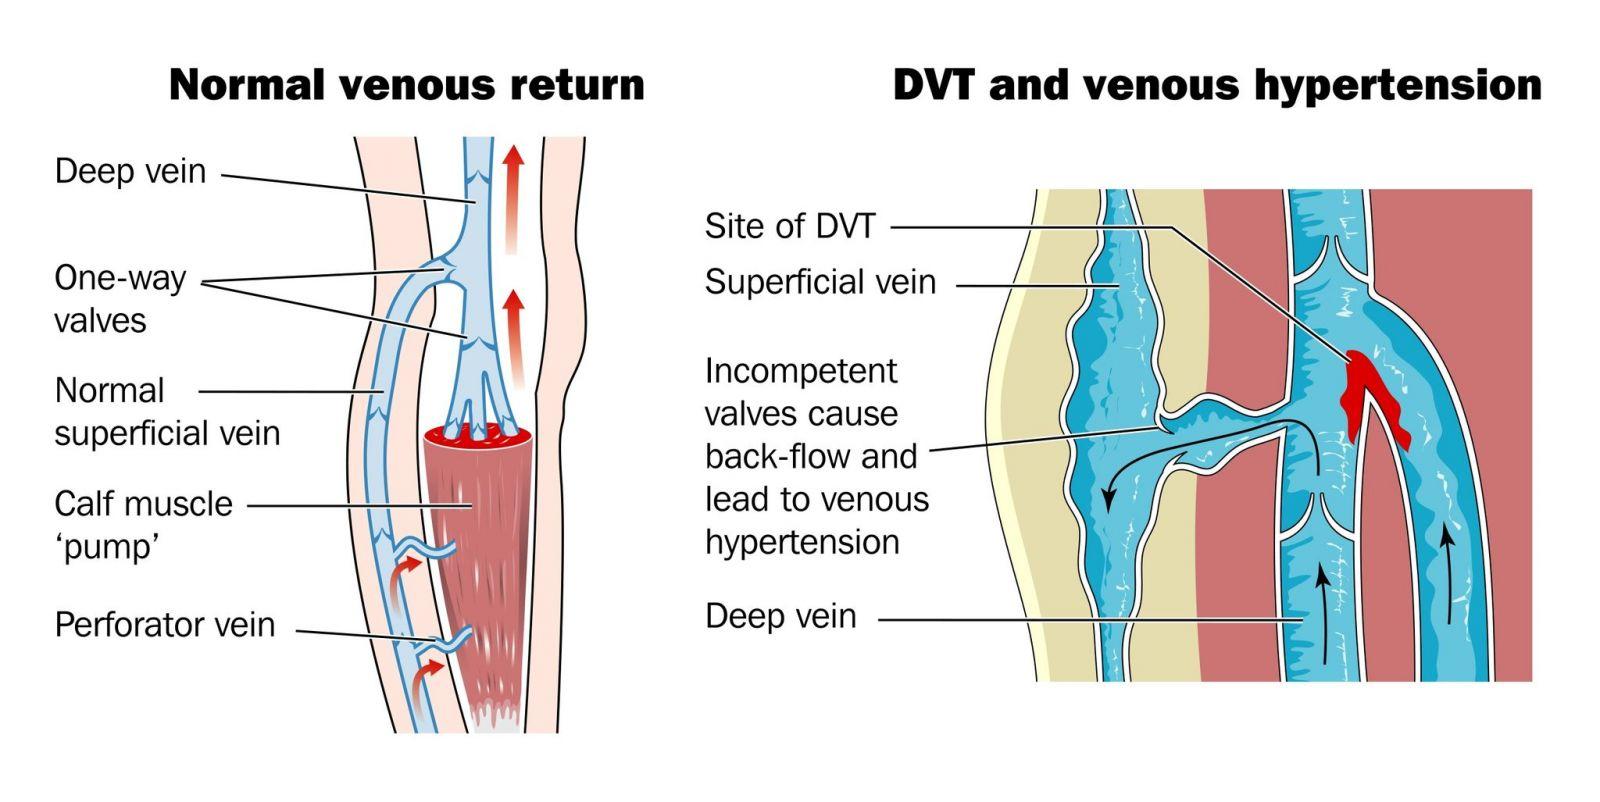 deep vein thrombosis singapore | causes symptoms diagnosis, Human Body